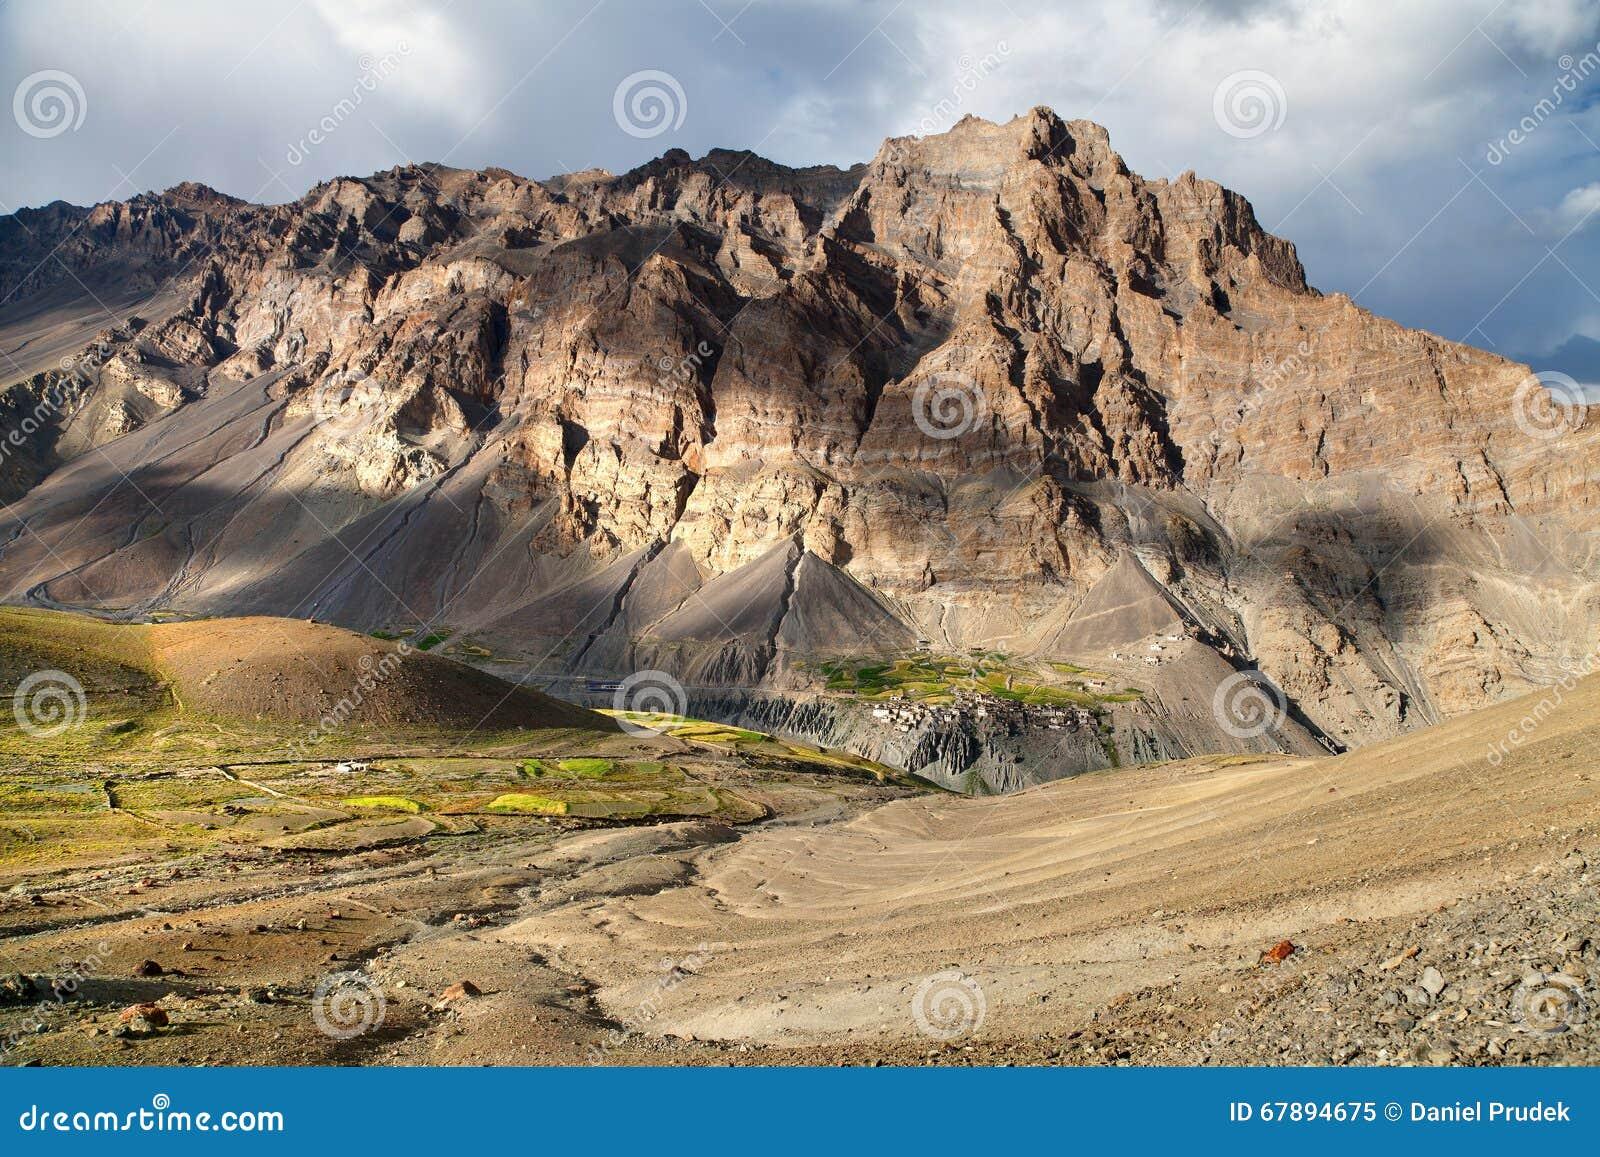 Photoksar村庄- Zanskar艰苦跋涉-拉达克-印度